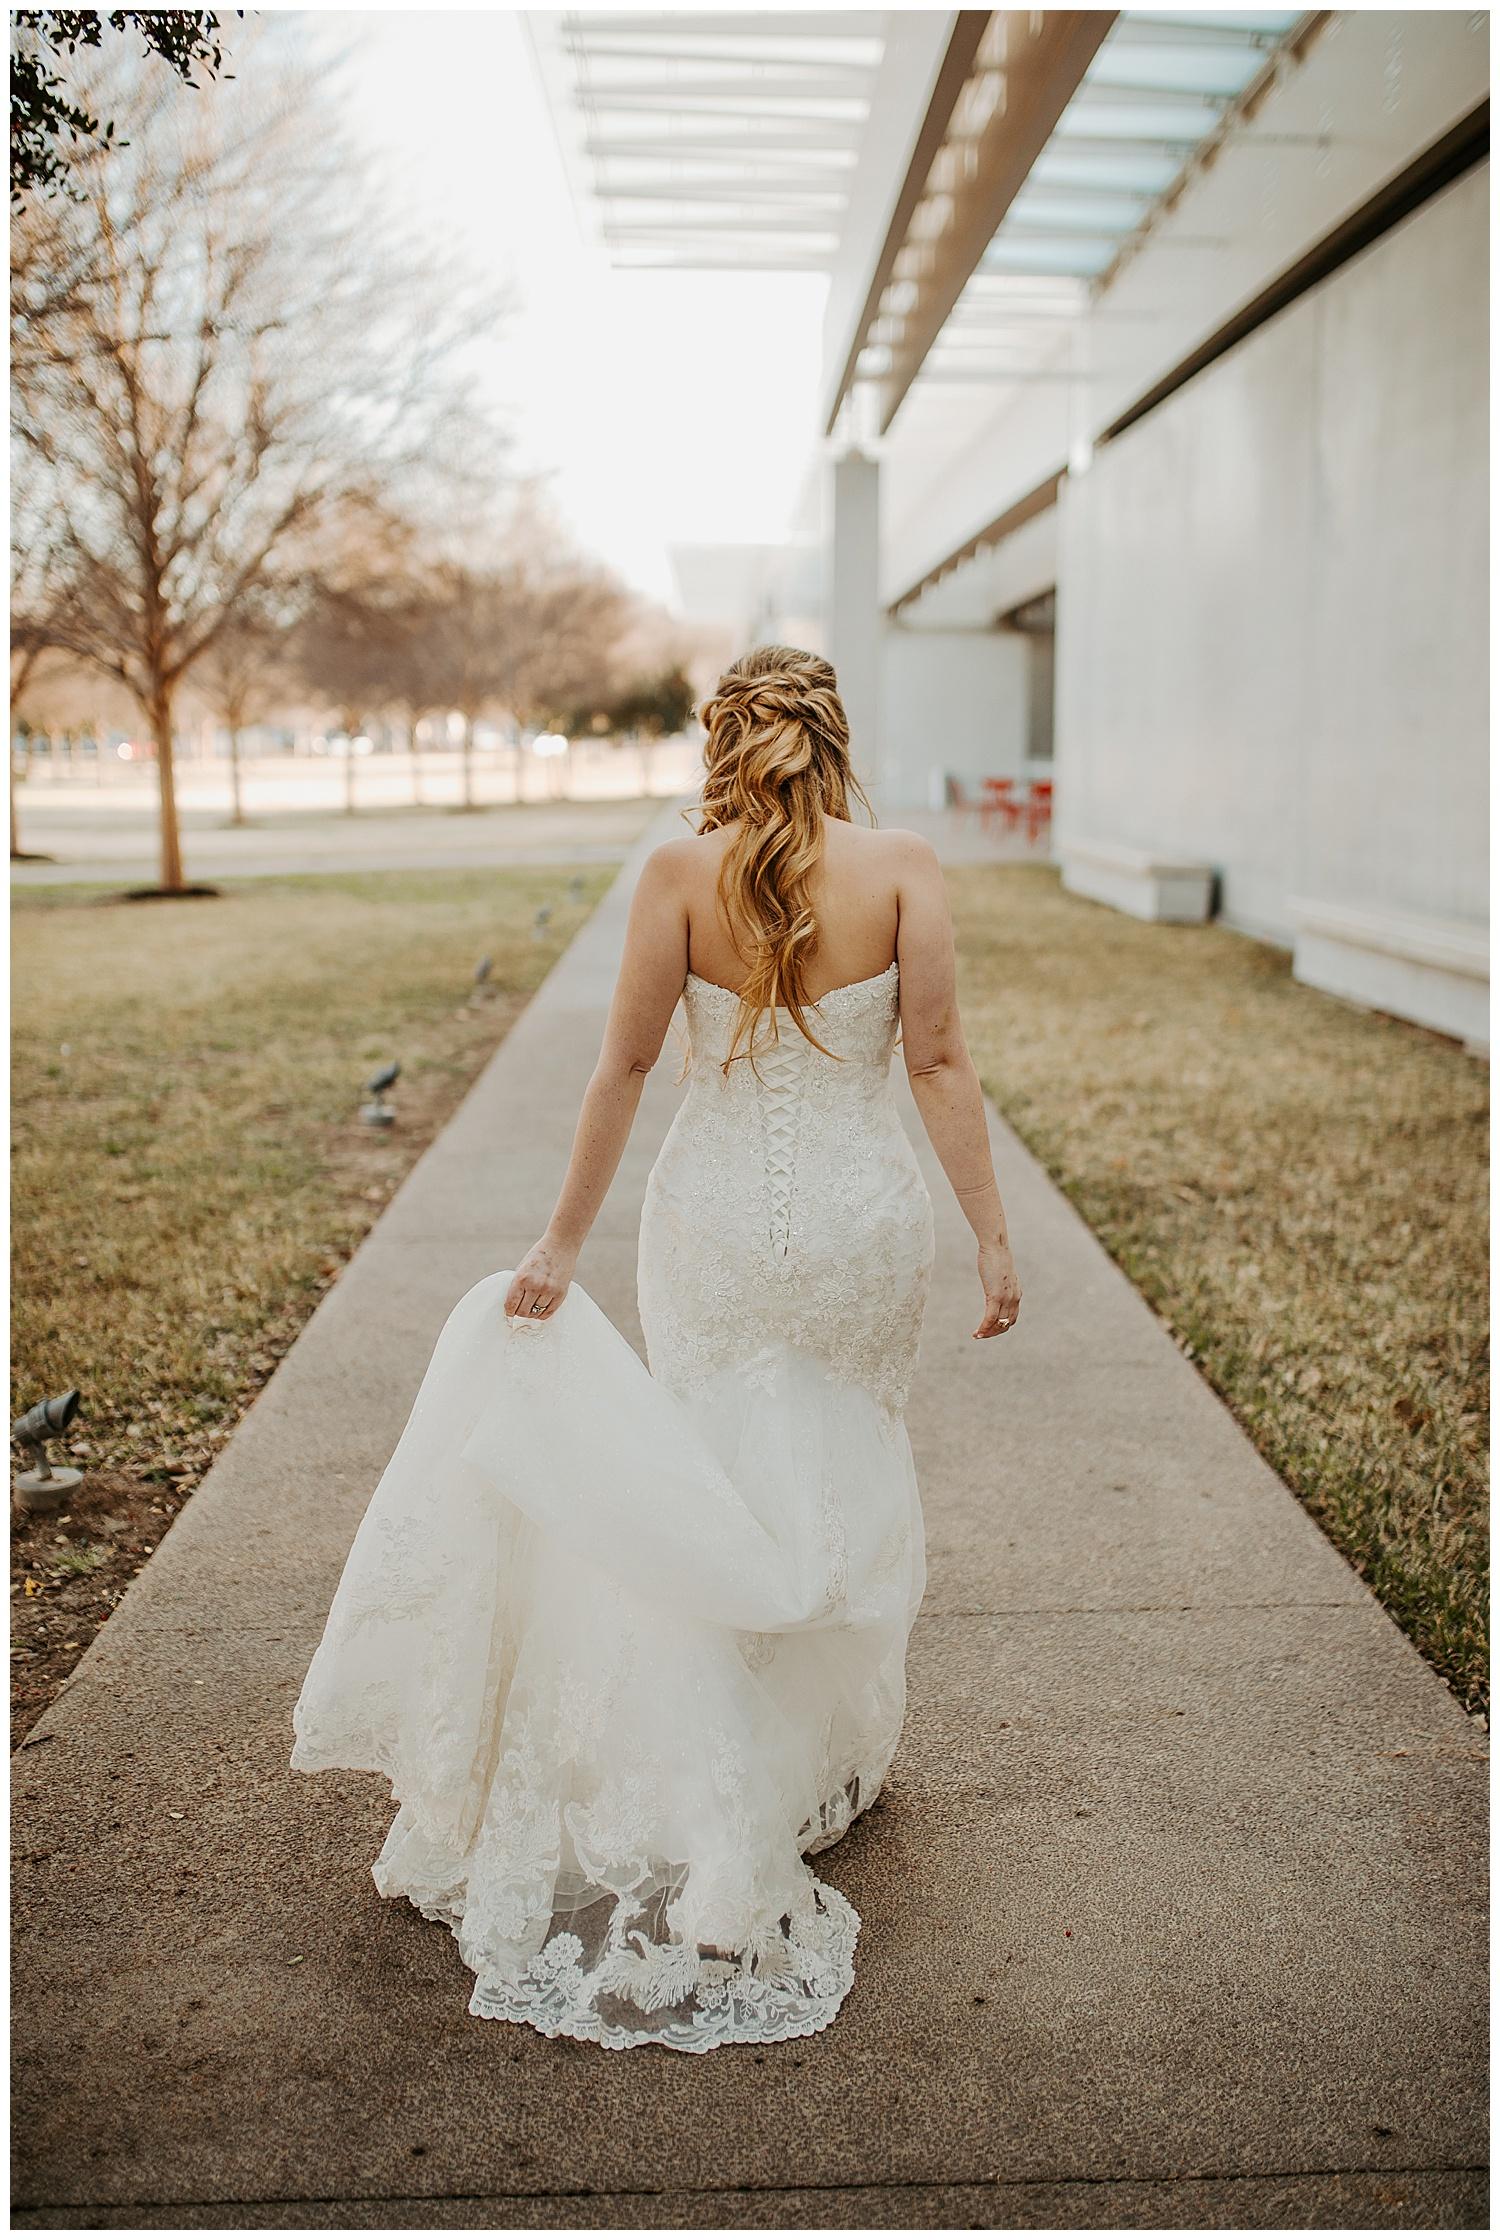 Laken-Mackenzie-Photography-Alyssa-Bridals-Kimbell-Art-Museum-Dallas-Fort-Worth-Wedding-Photographer10.jpg